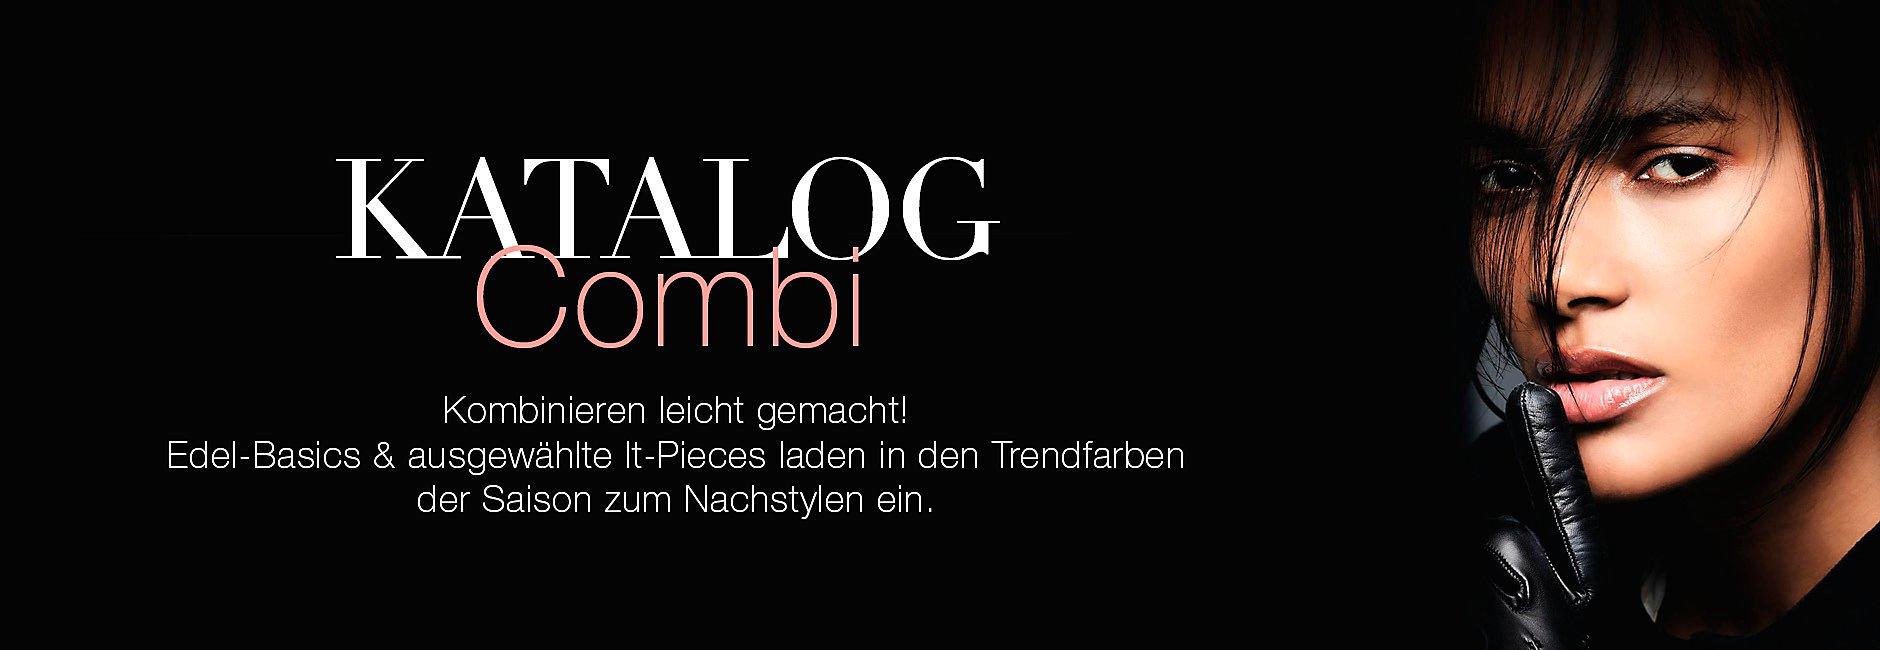 CHD_Kataloge_Combi_d.jpg